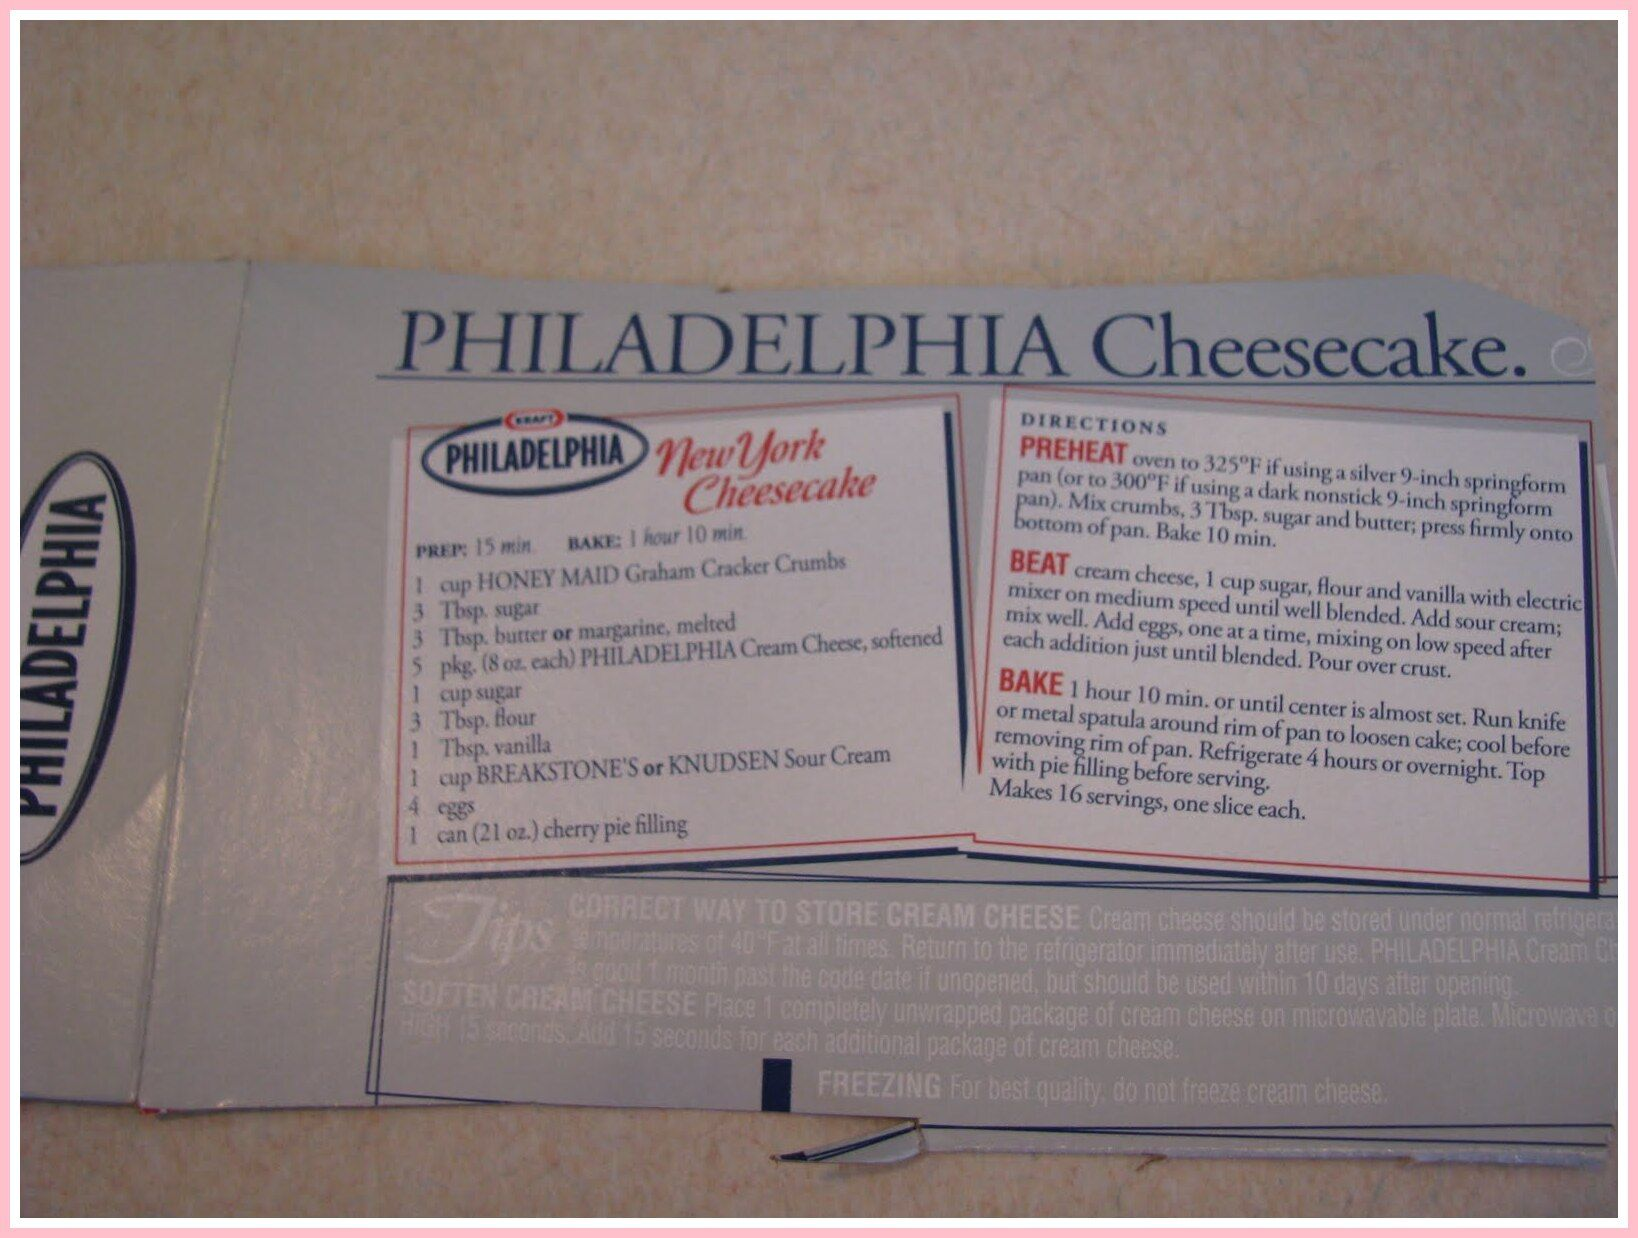 130 Reference Of Philadelphia Cheesecake Recipe On Box In 2020 Cheesecake Recipes Cheesecake Recipes Philadelphia Philadelphia Cheesecake